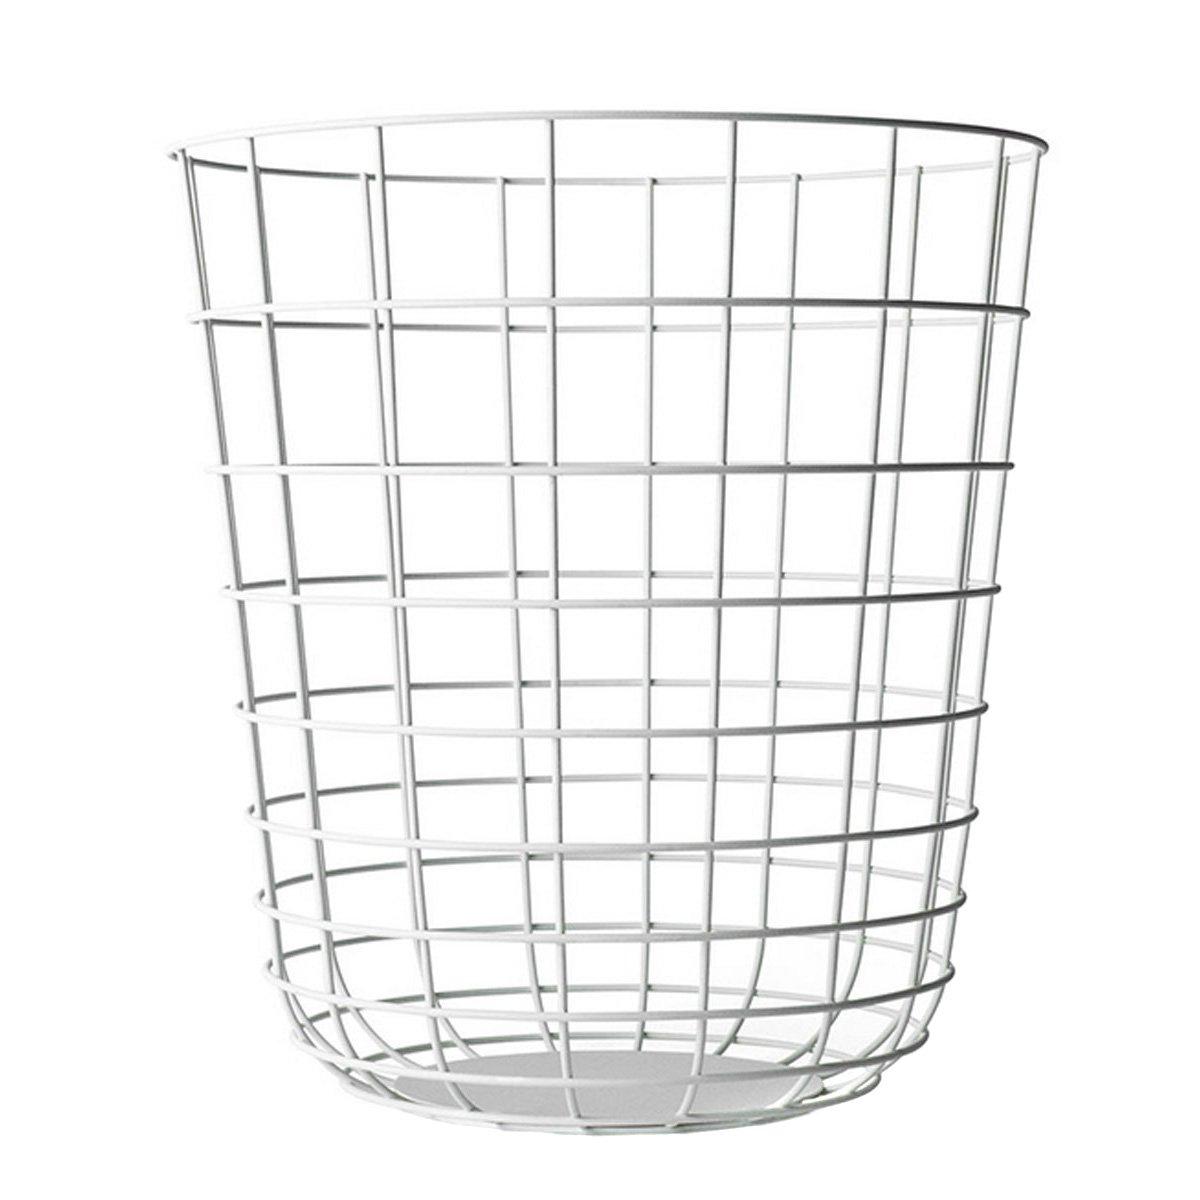 Menu 9000639 Draht-Papierkorb, Höhe 35 cm, Durchmesser 32 cm, weiß ...